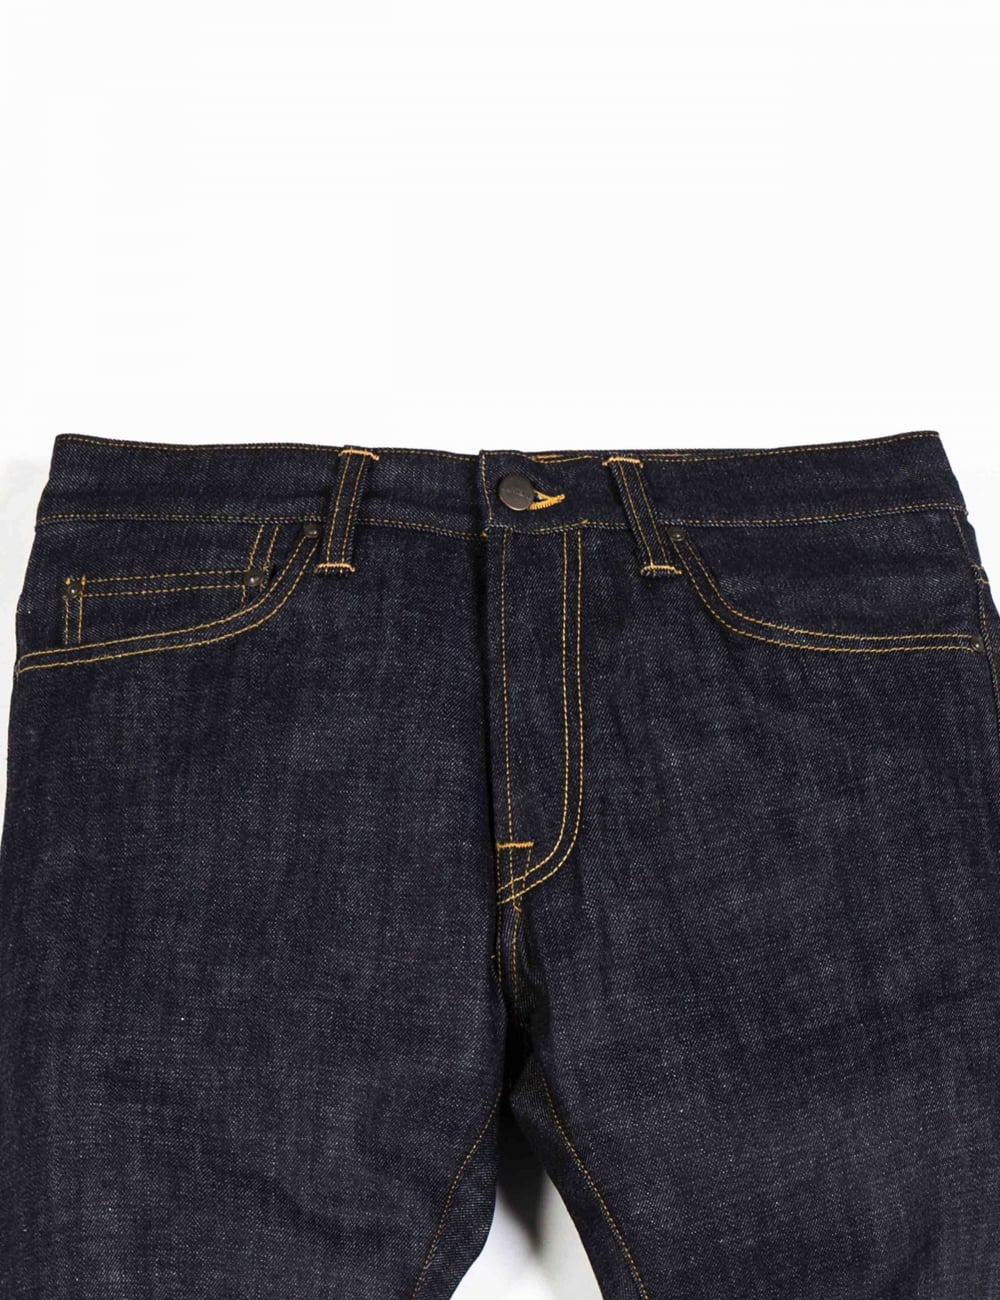 a573014564 Carhartt WIP Oakland Pant - Blue Rigid (Edgewood Denim) - Clothing ...